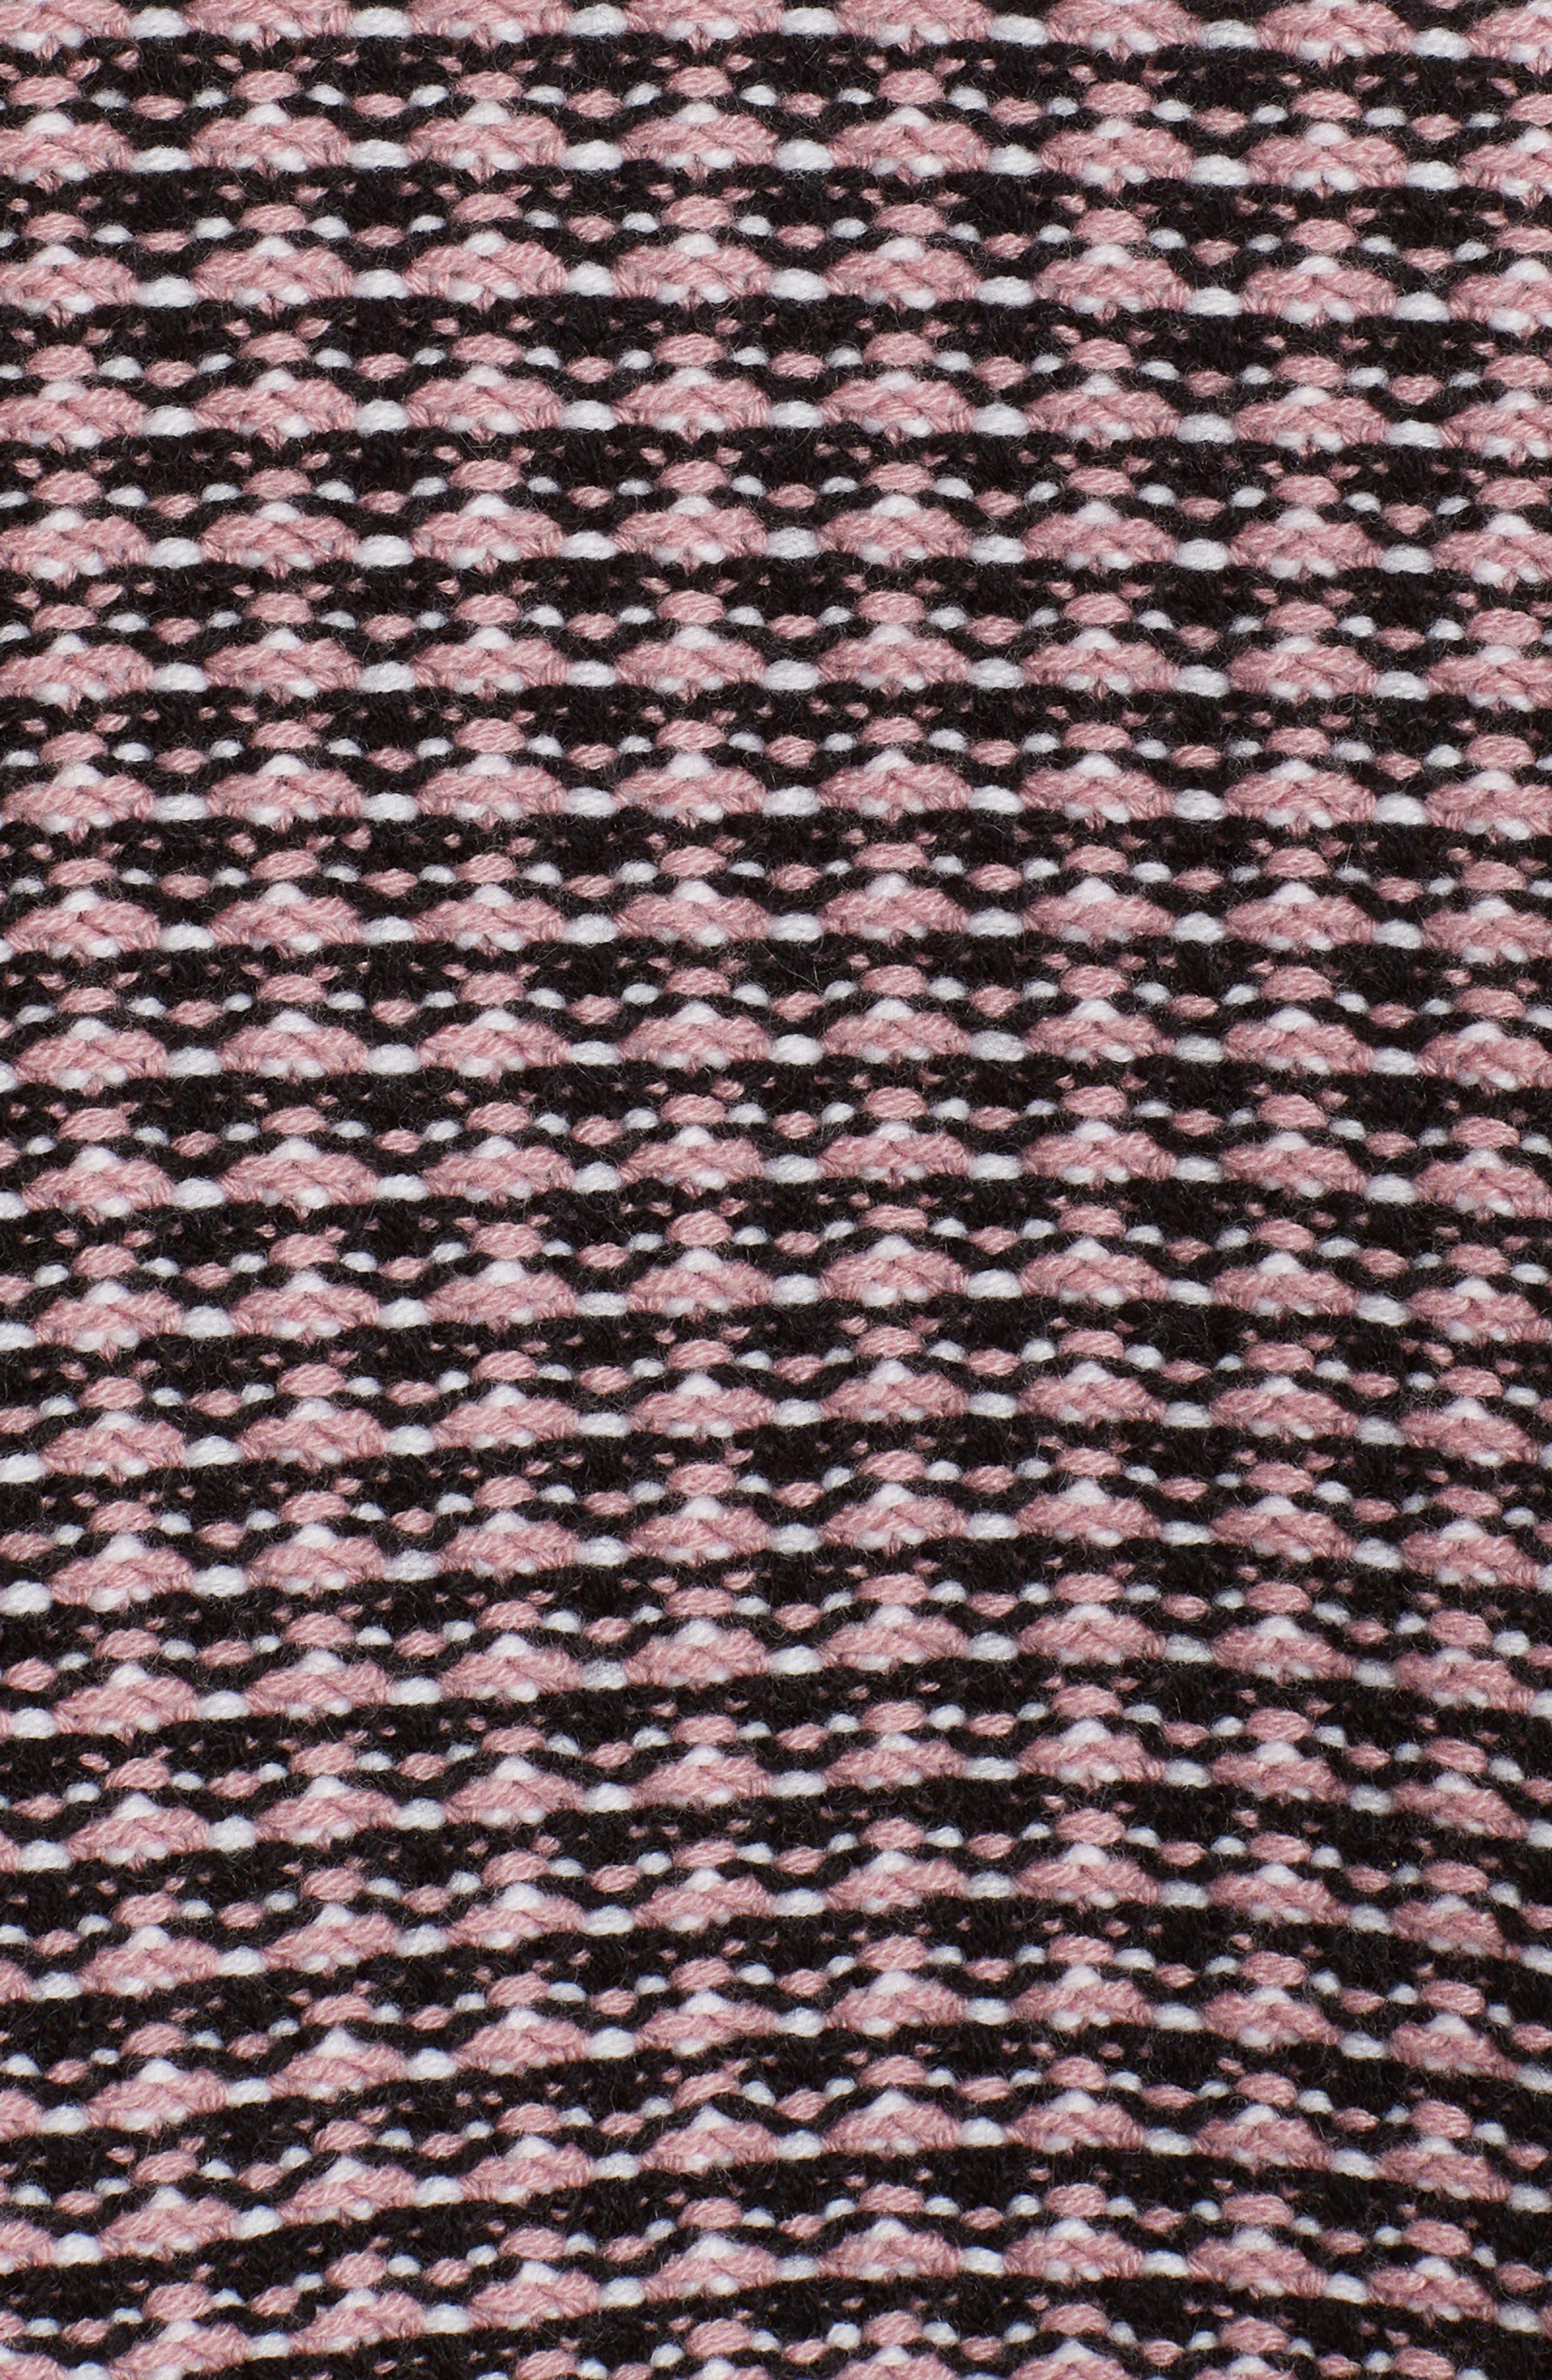 Microcheck Wool & Cashmere Sweater,                             Alternate thumbnail 5, color,                             ARUBA PINK